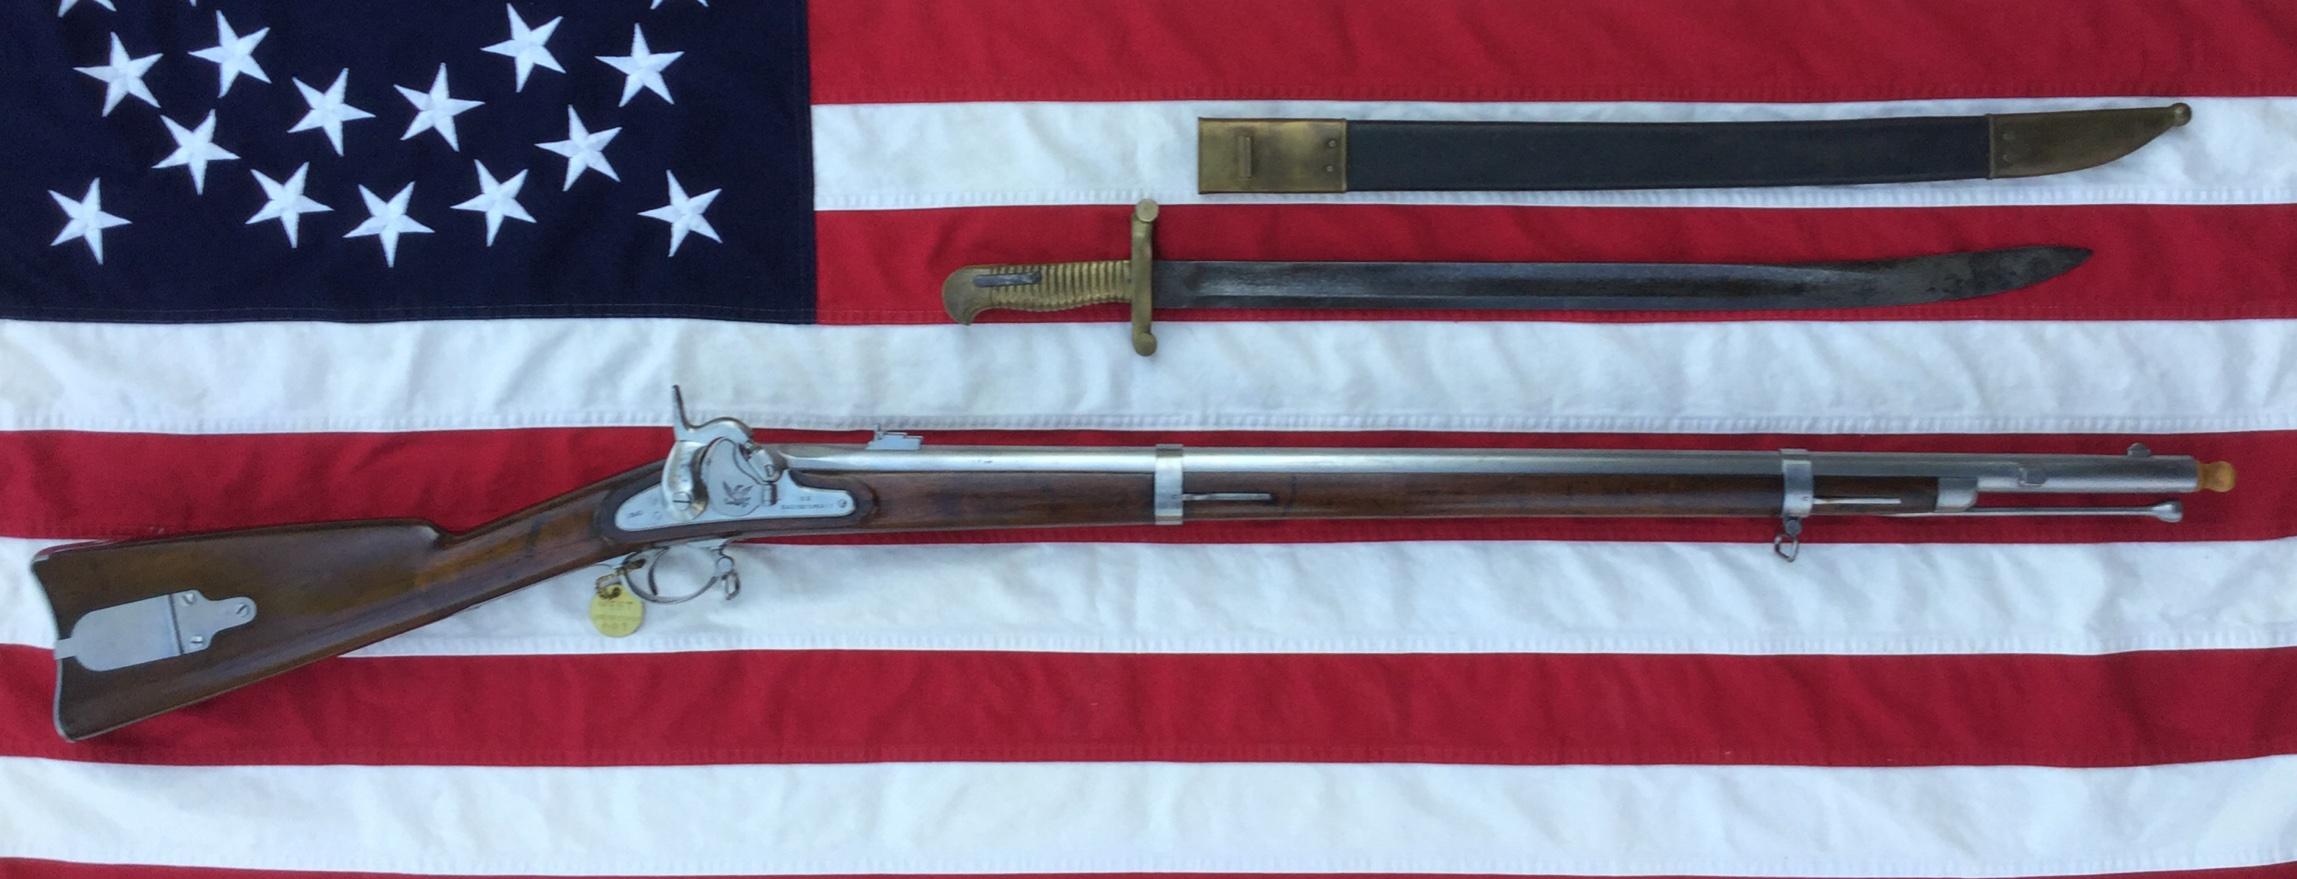 1860 Harper's Ferry Rifle & Saber Bayonet